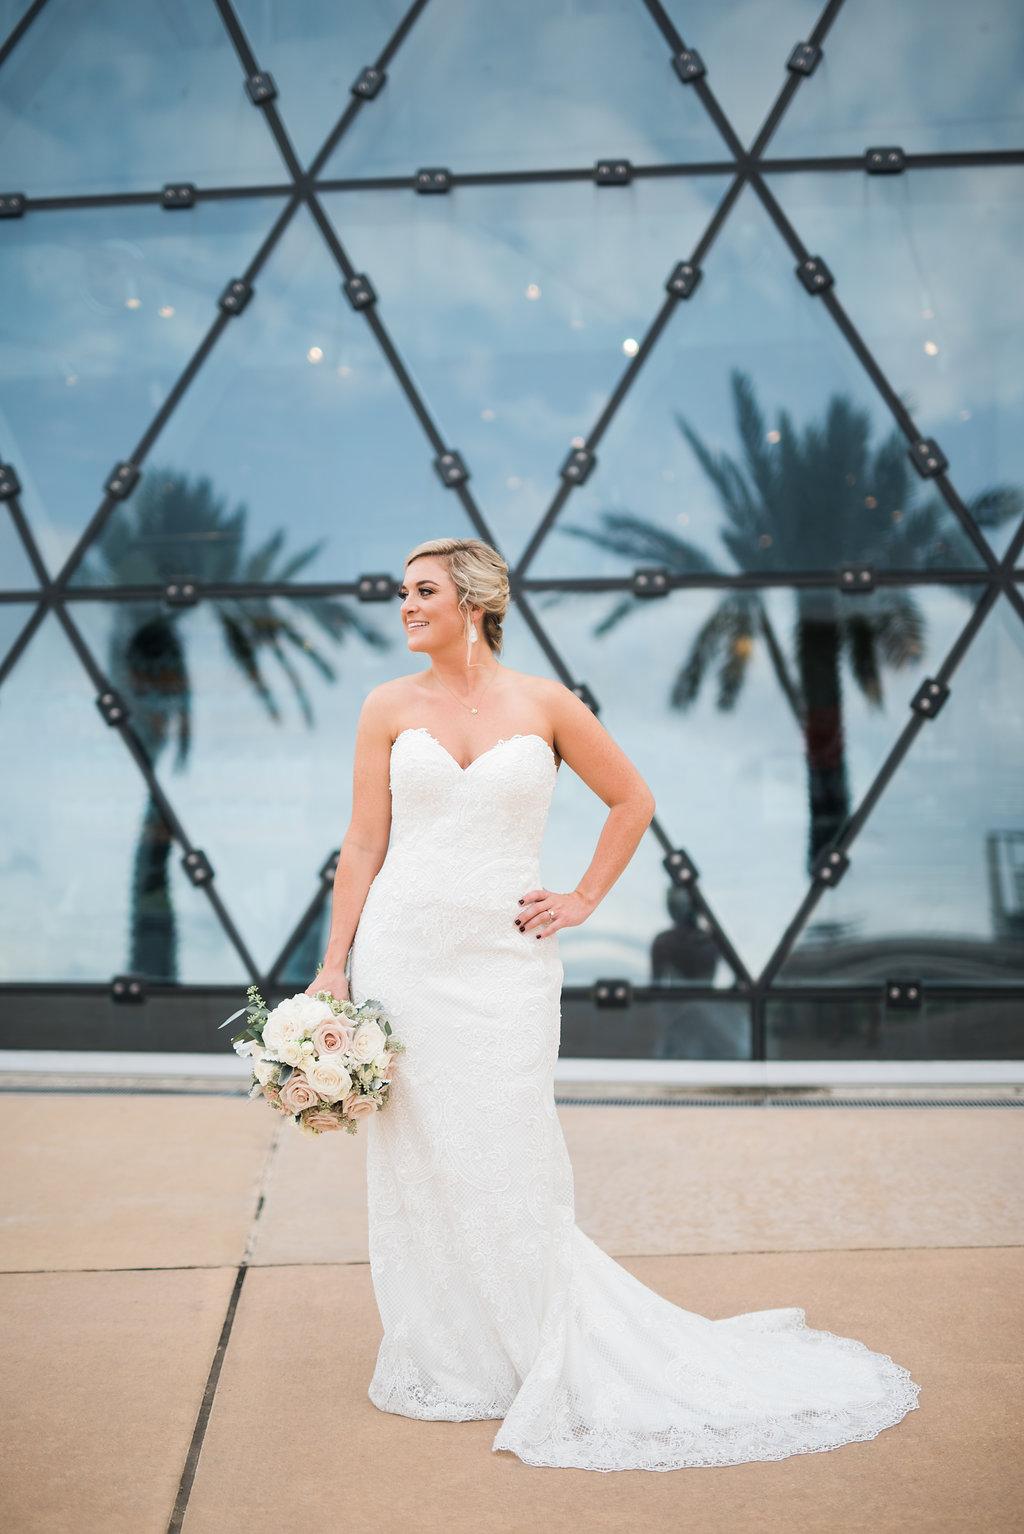 Lace Wedding Dress - Minimalist Wedding - Tampa Wedding Venue